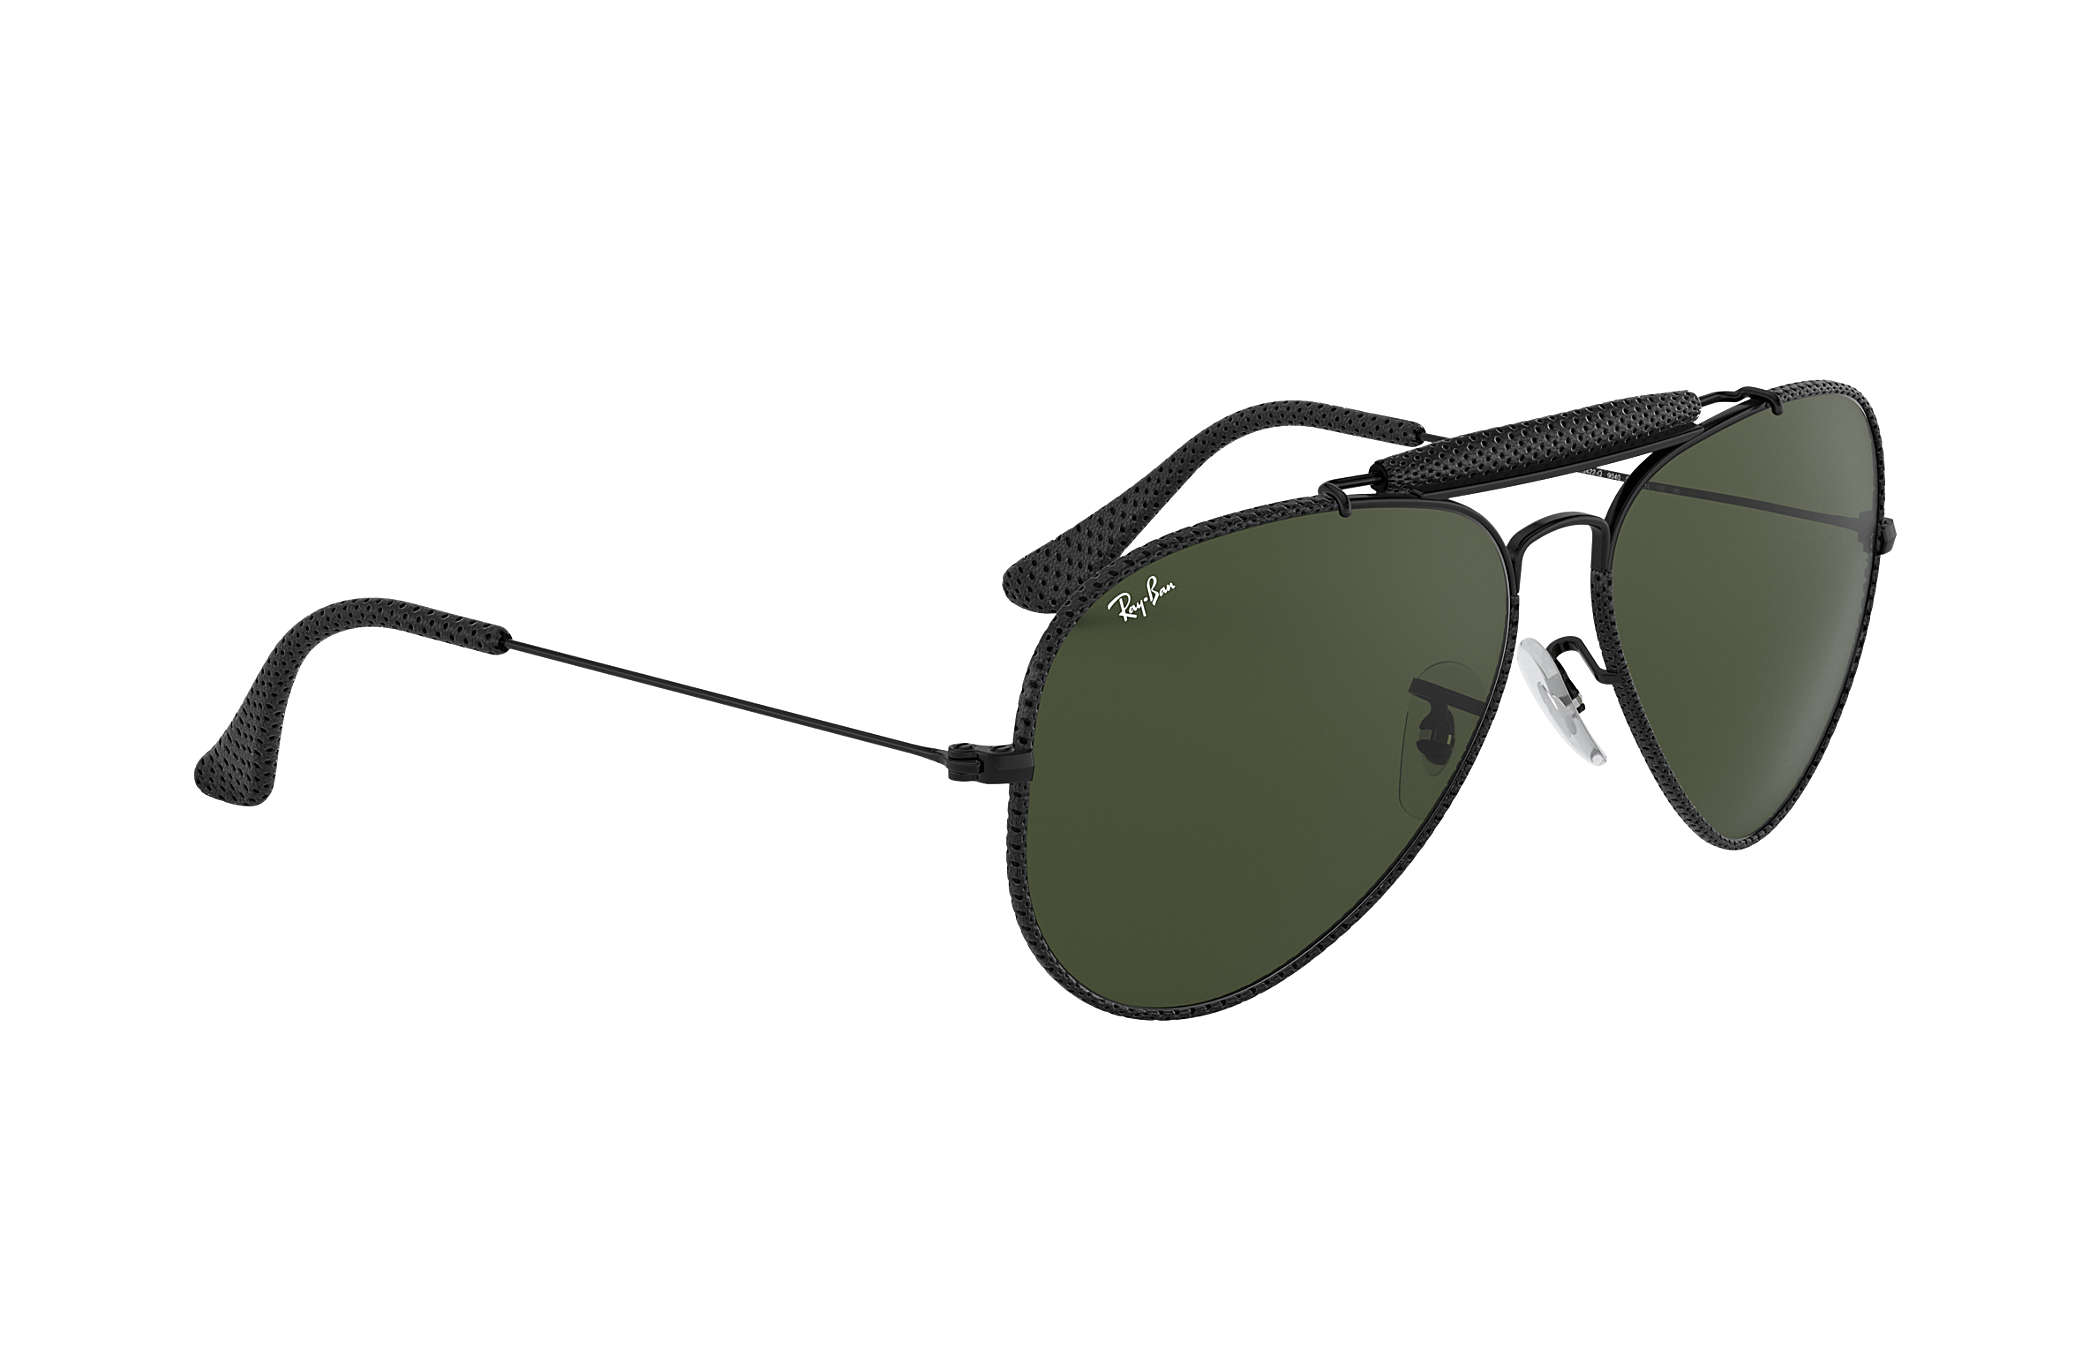 5182f16f6b Ray-Ban Outdoorsman Craft RB3422Q Black - Metal - Green Lenses ...